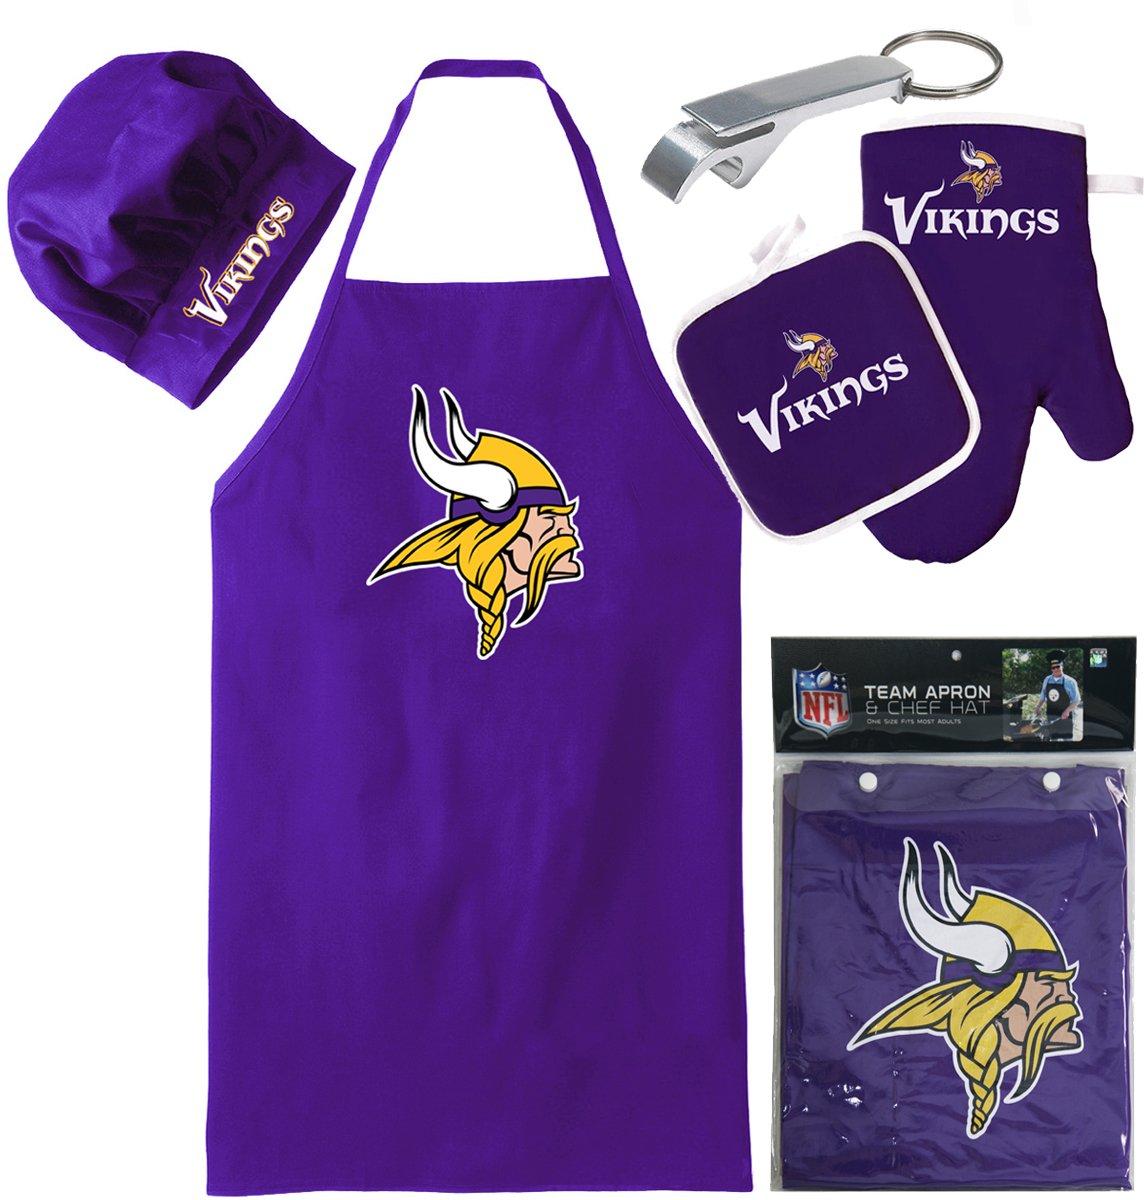 Minnesota Vikings (Apron & Oven Mitt Pot Holder), Bonus Bottle Beer Opener, Barbeque Apron and Chef's Hat , NFL Licensed